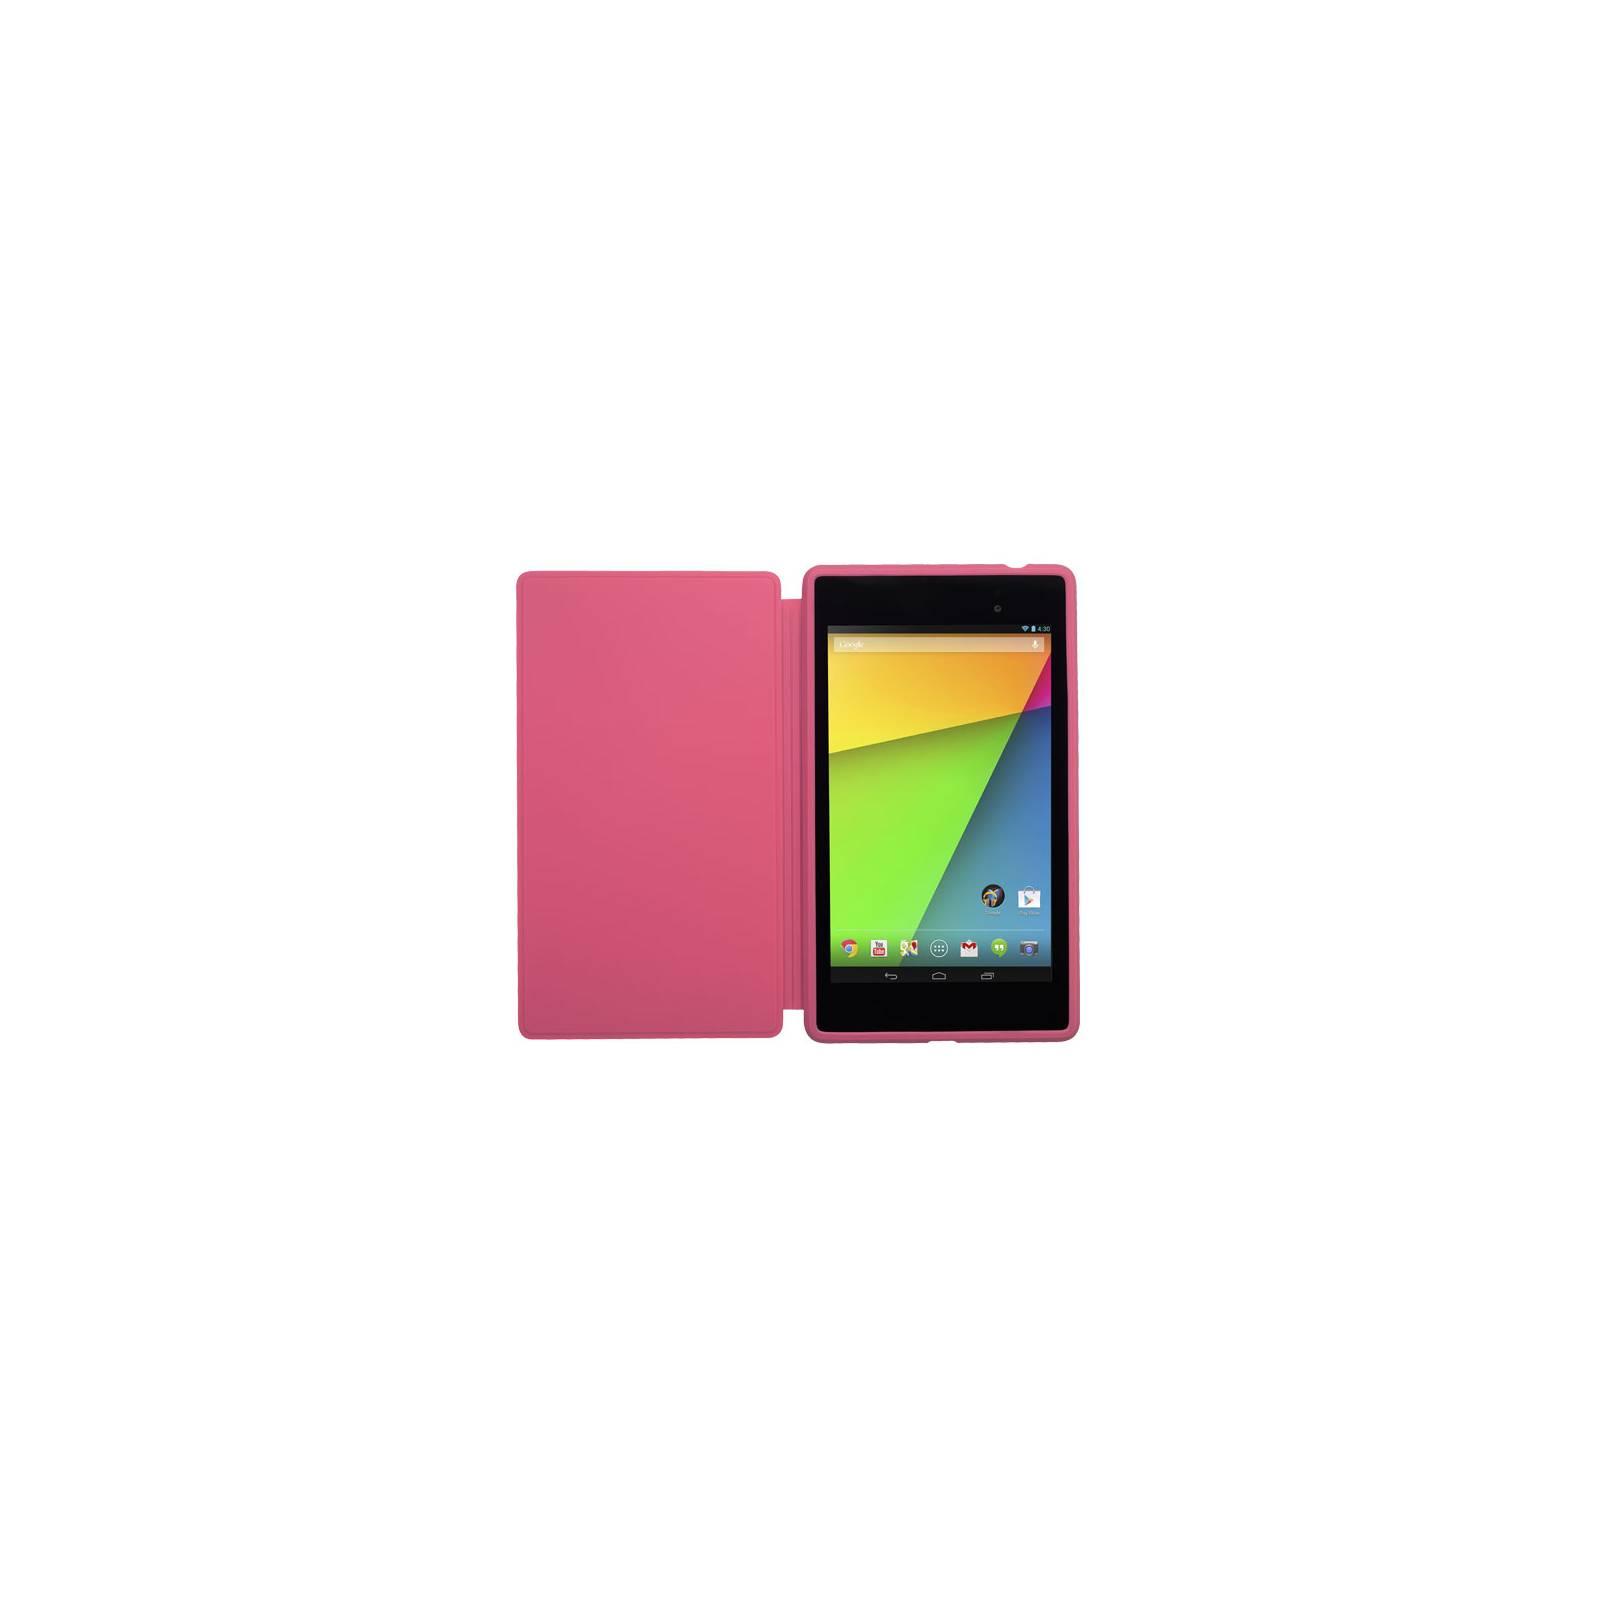 Чехол для планшета ASUS Nexus 7 2013 TRAVEL COVER V2 PINK (90-XB3TOKSL001P0-) изображение 3